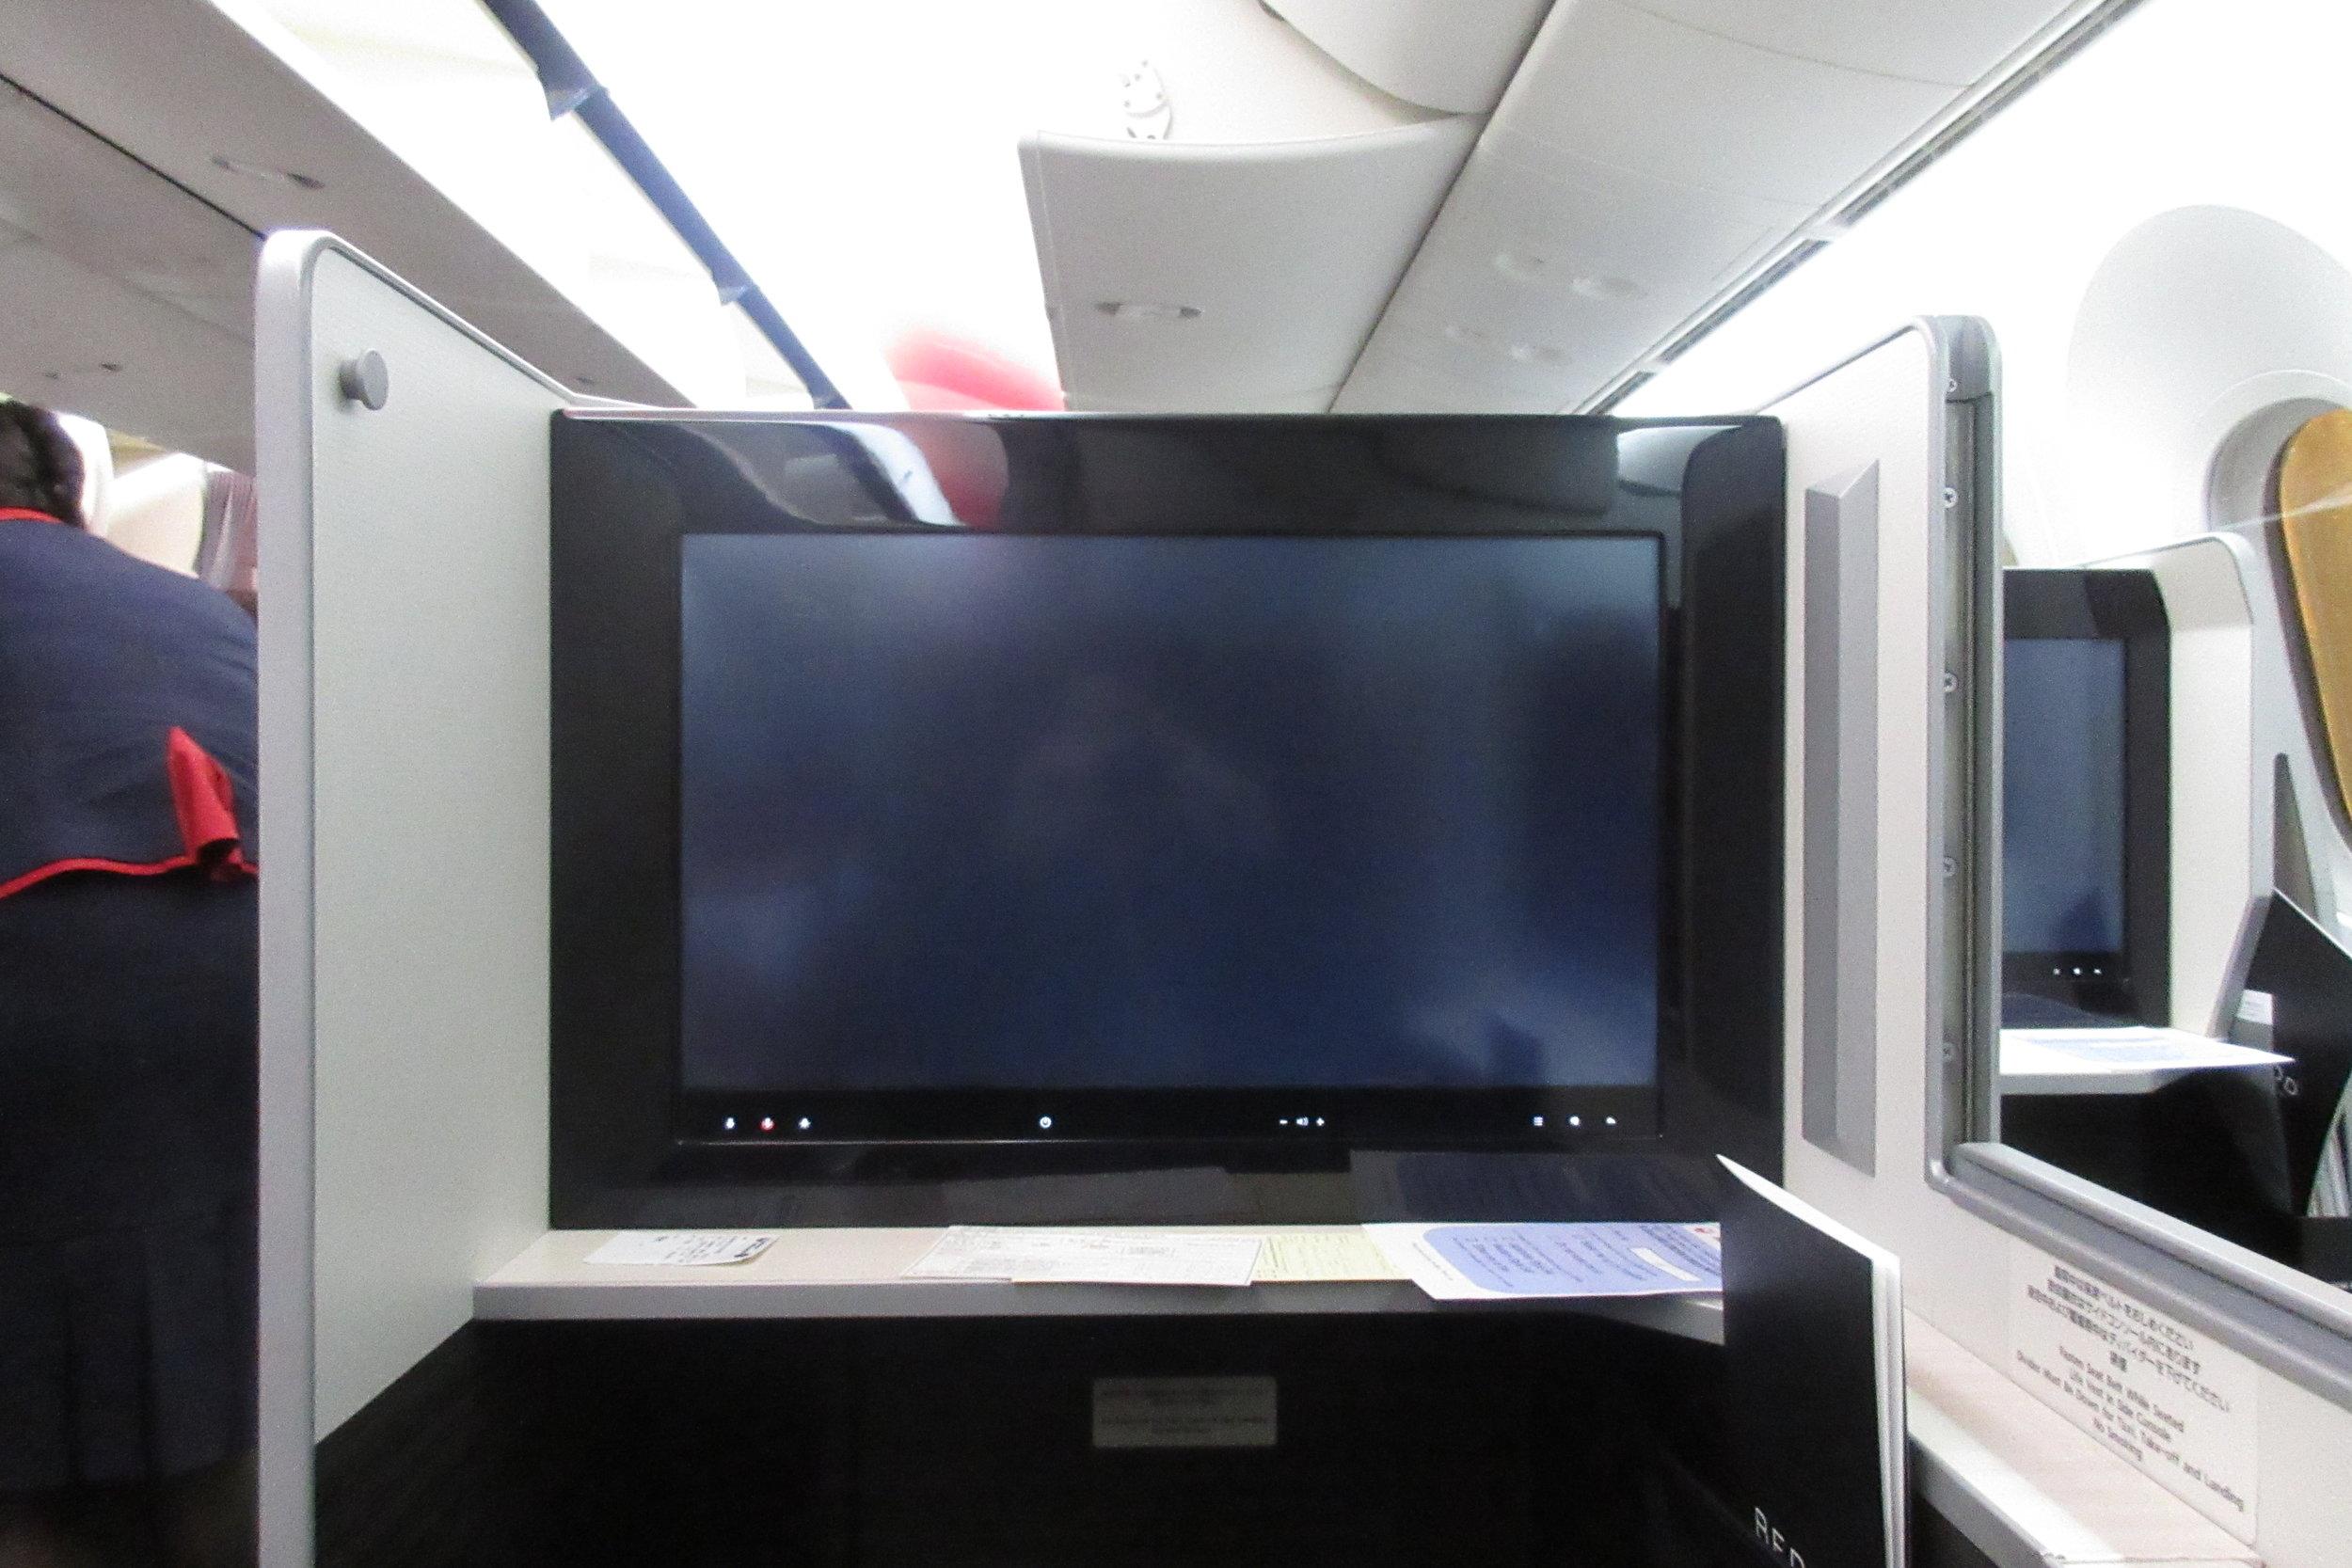 Japan Airlines business class – Entertainment screen